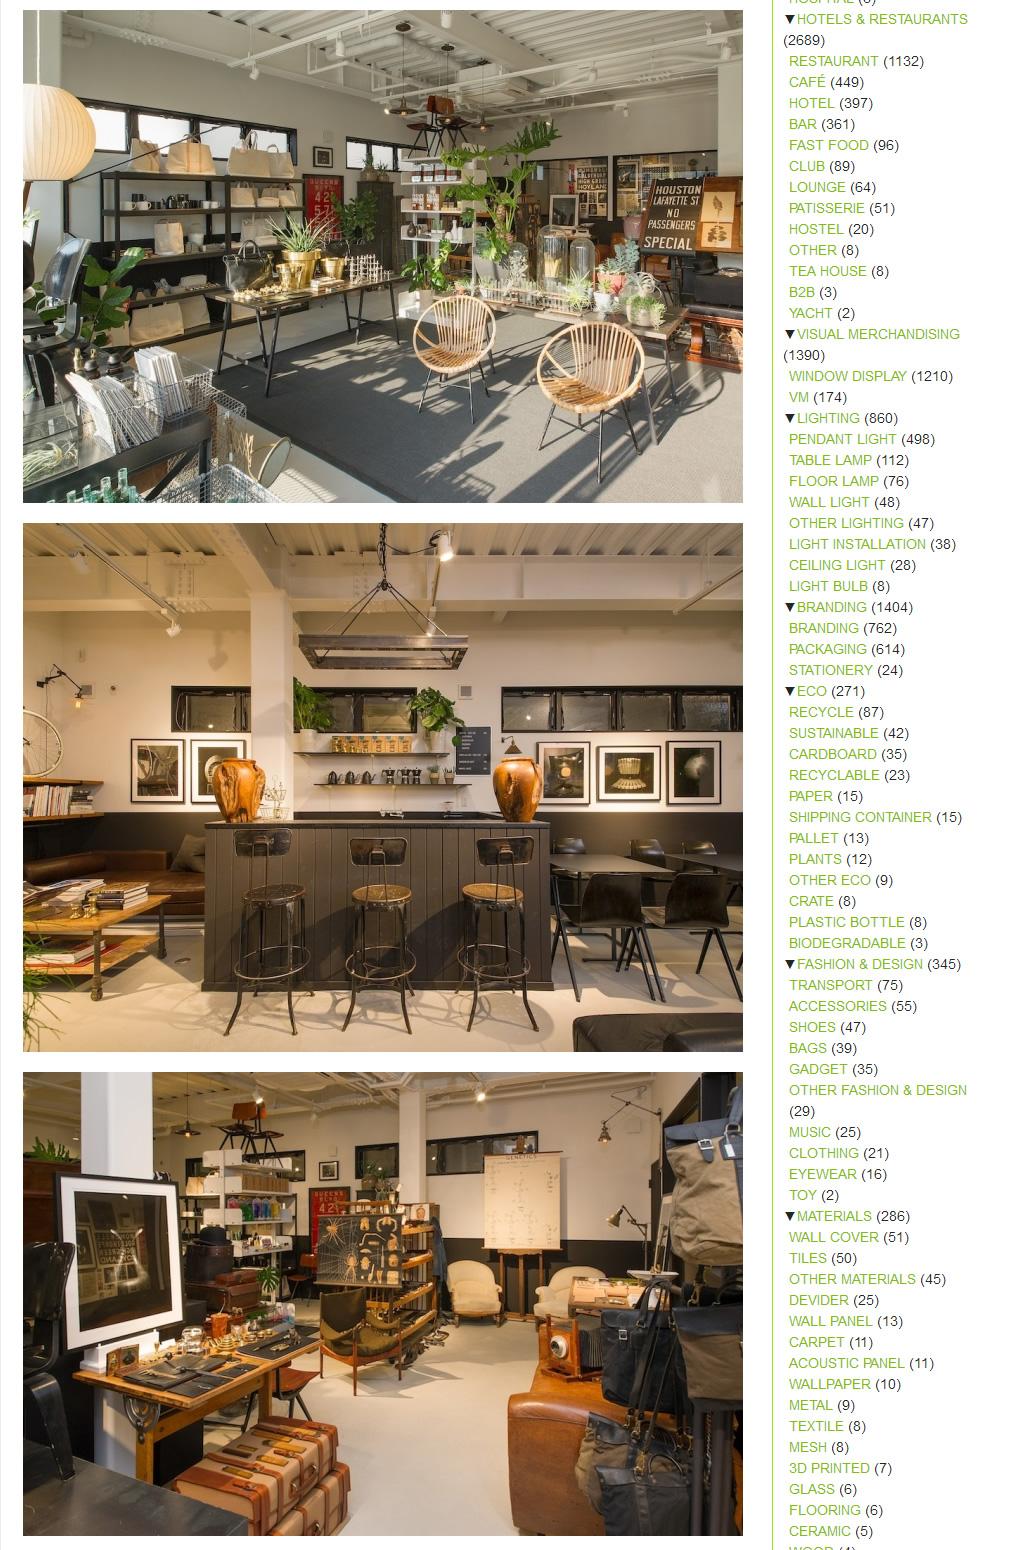 retaildesignblog.net_2016_4